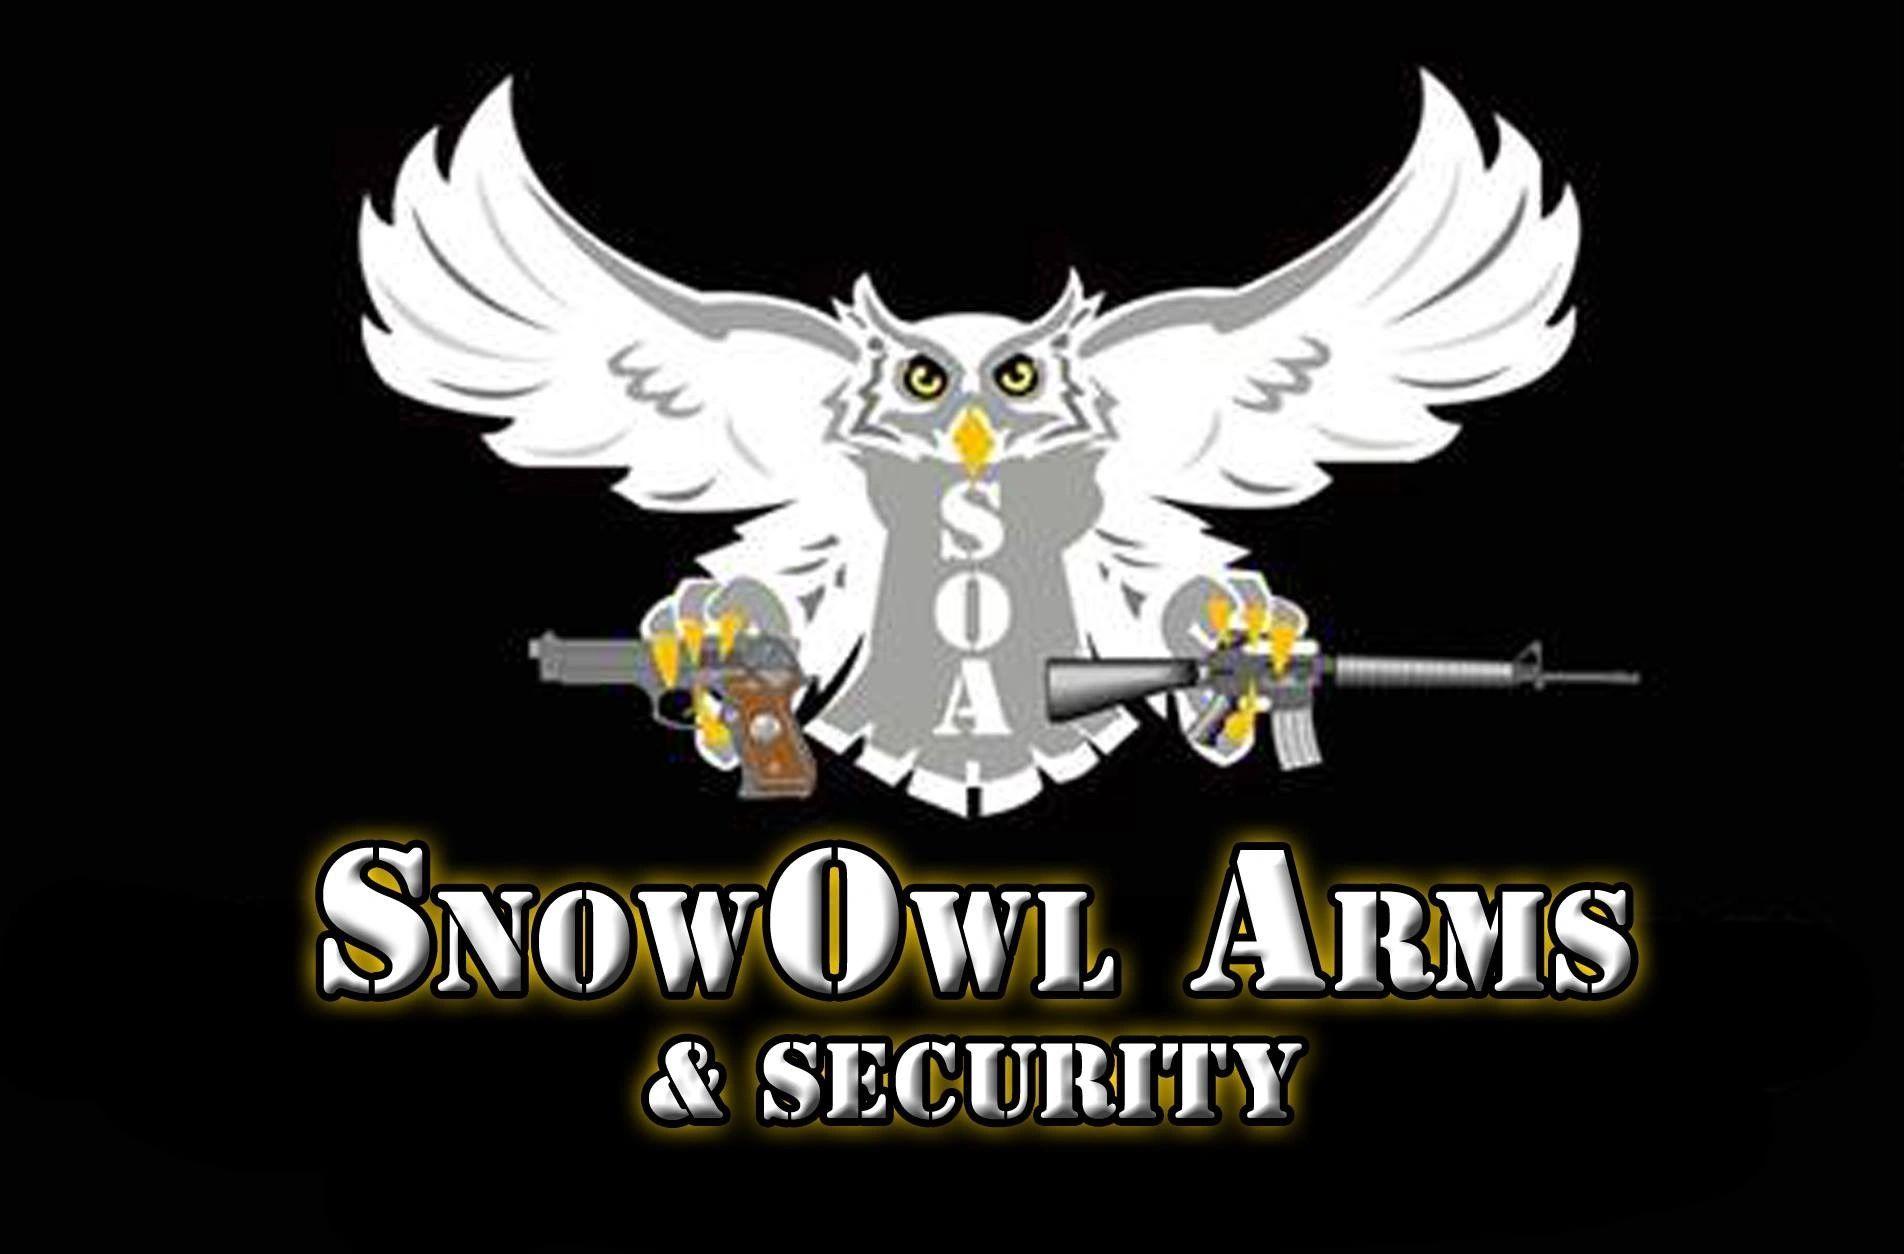 SnowOwl Arms & Security LLC logo